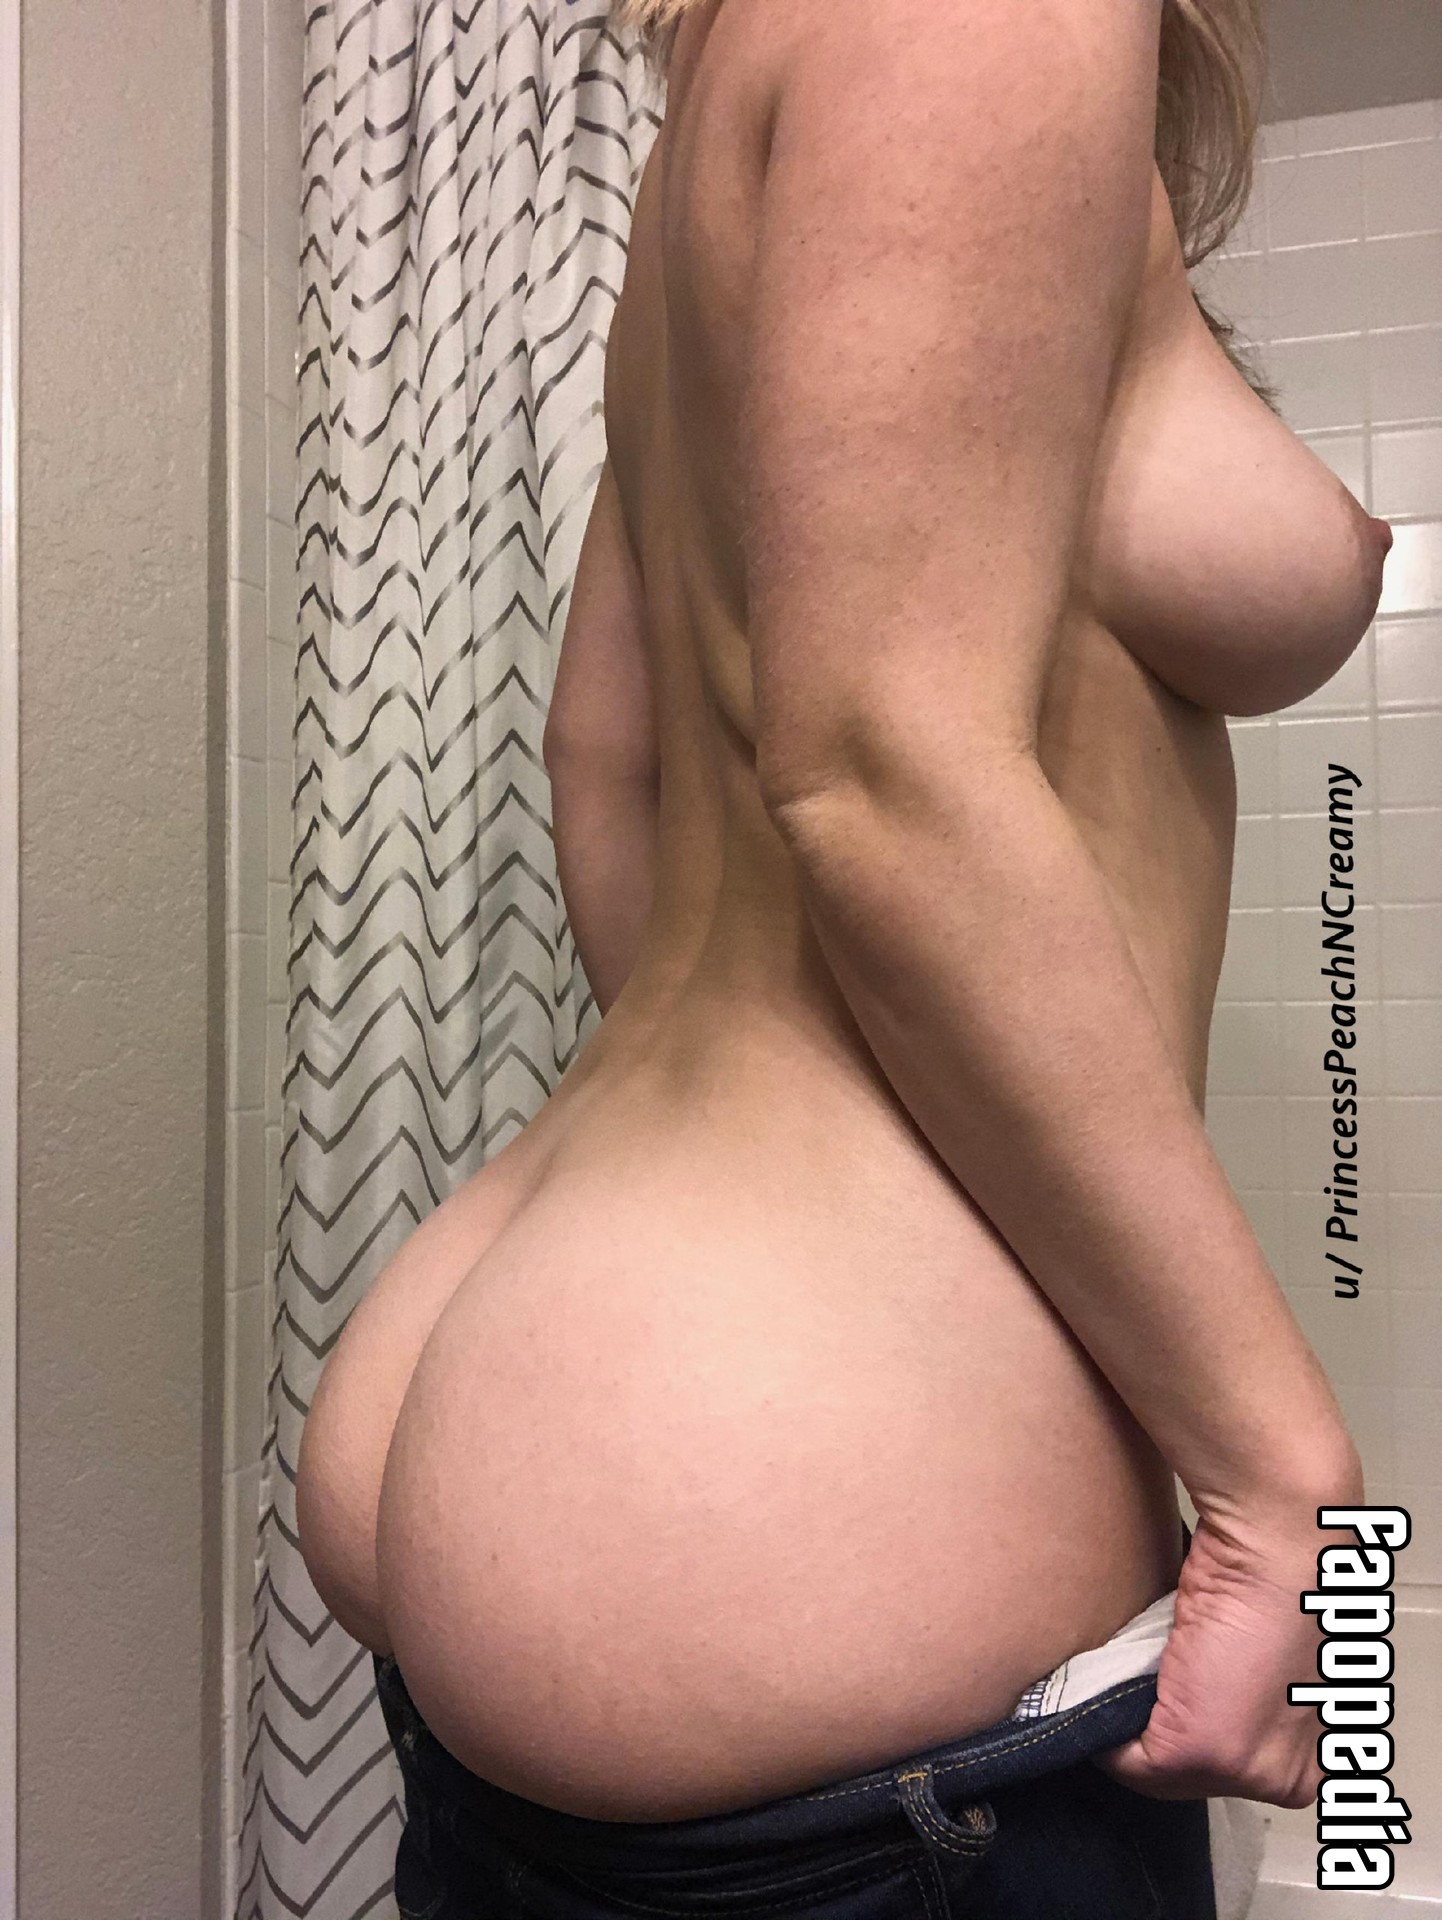 PrincessPeachNCreamy Nude Leaks